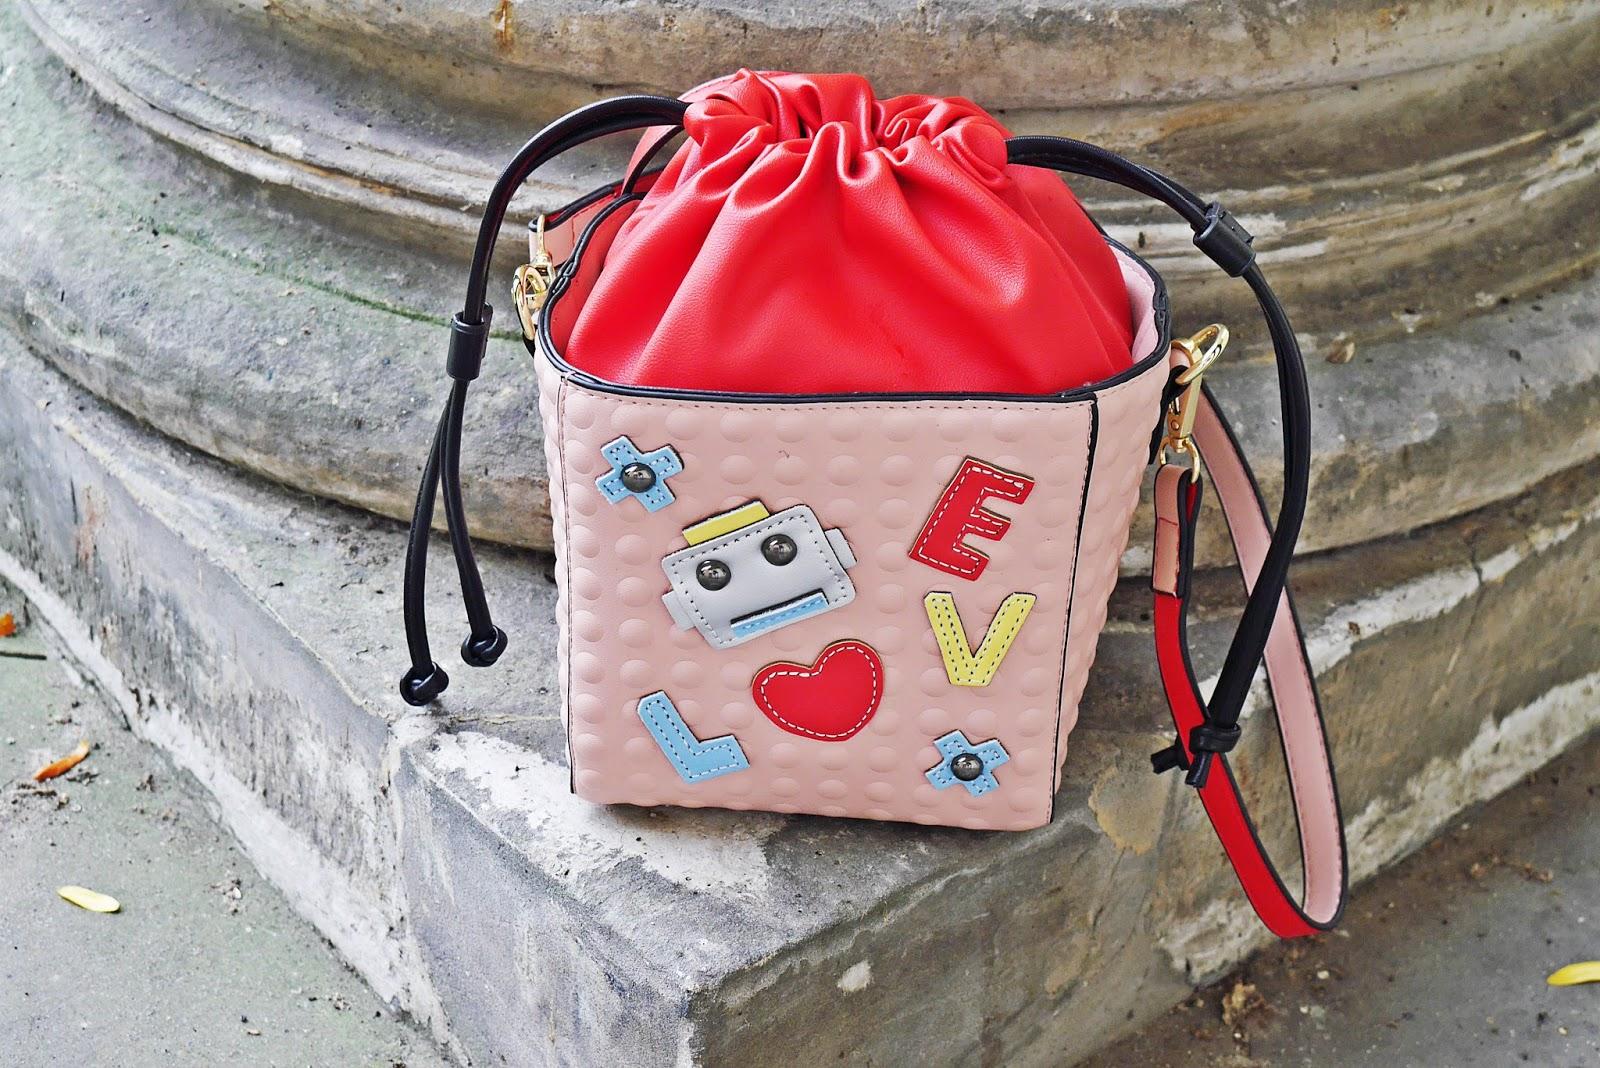 8_rozowa_torebka_gamis_pink_bag_karyn_blog_modowy_180917